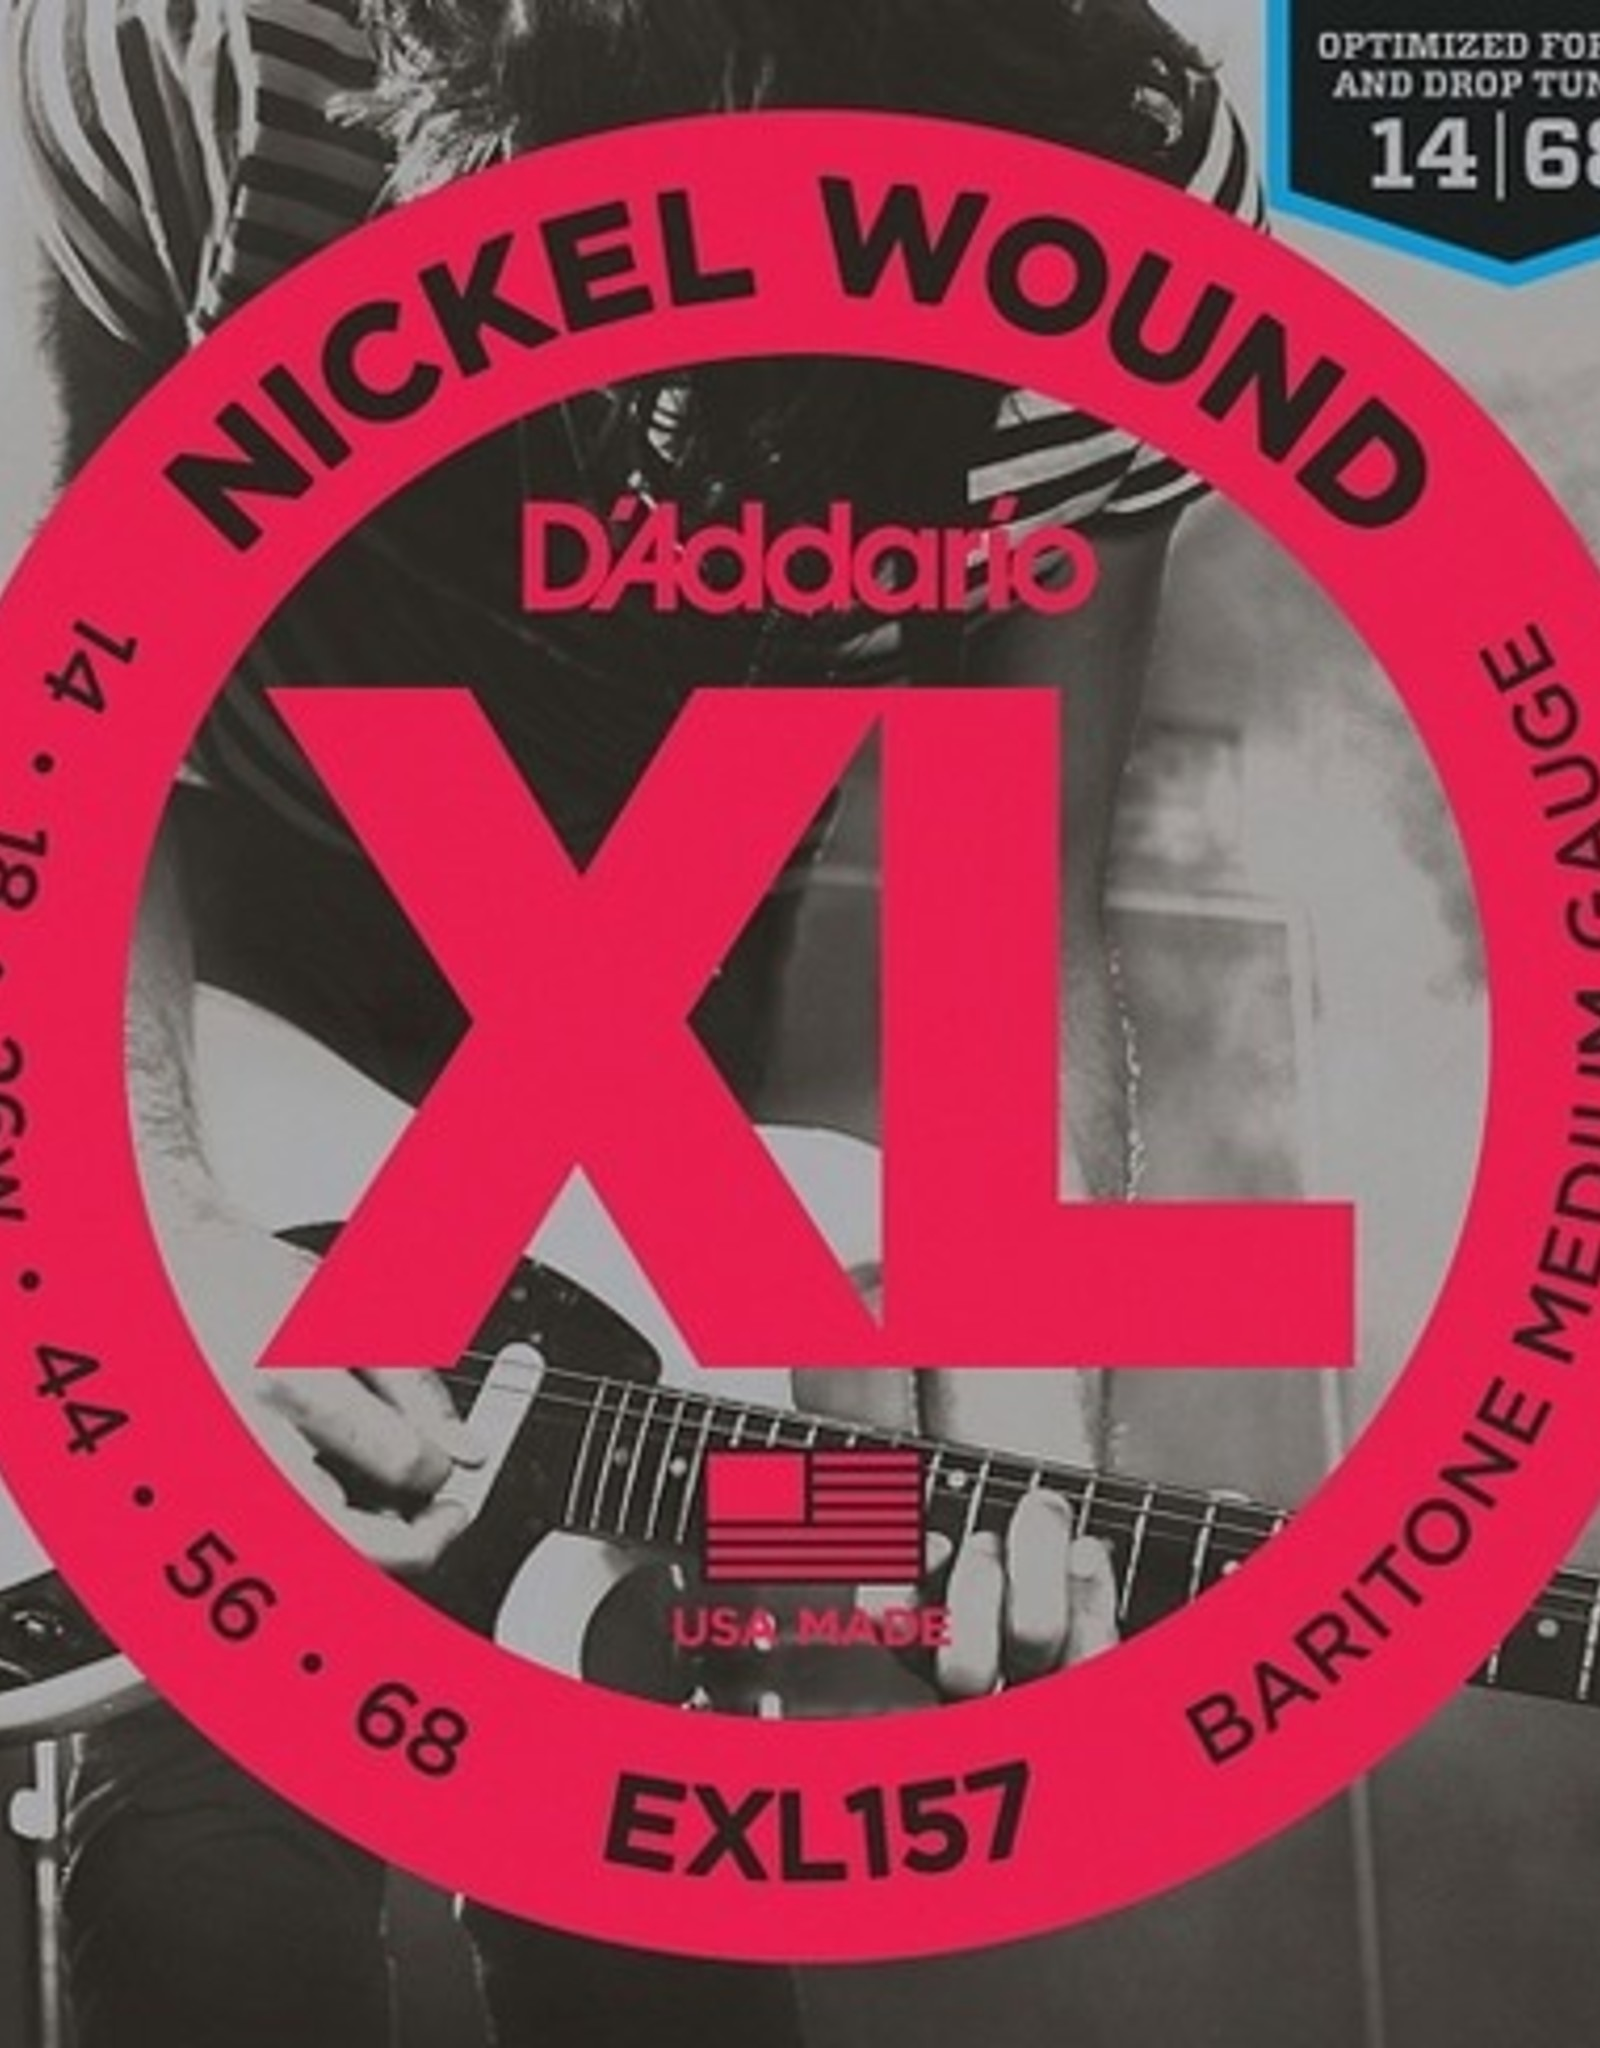 D'Addario D'ADDARIO EXL157 BARITONE GUITAR XL MED